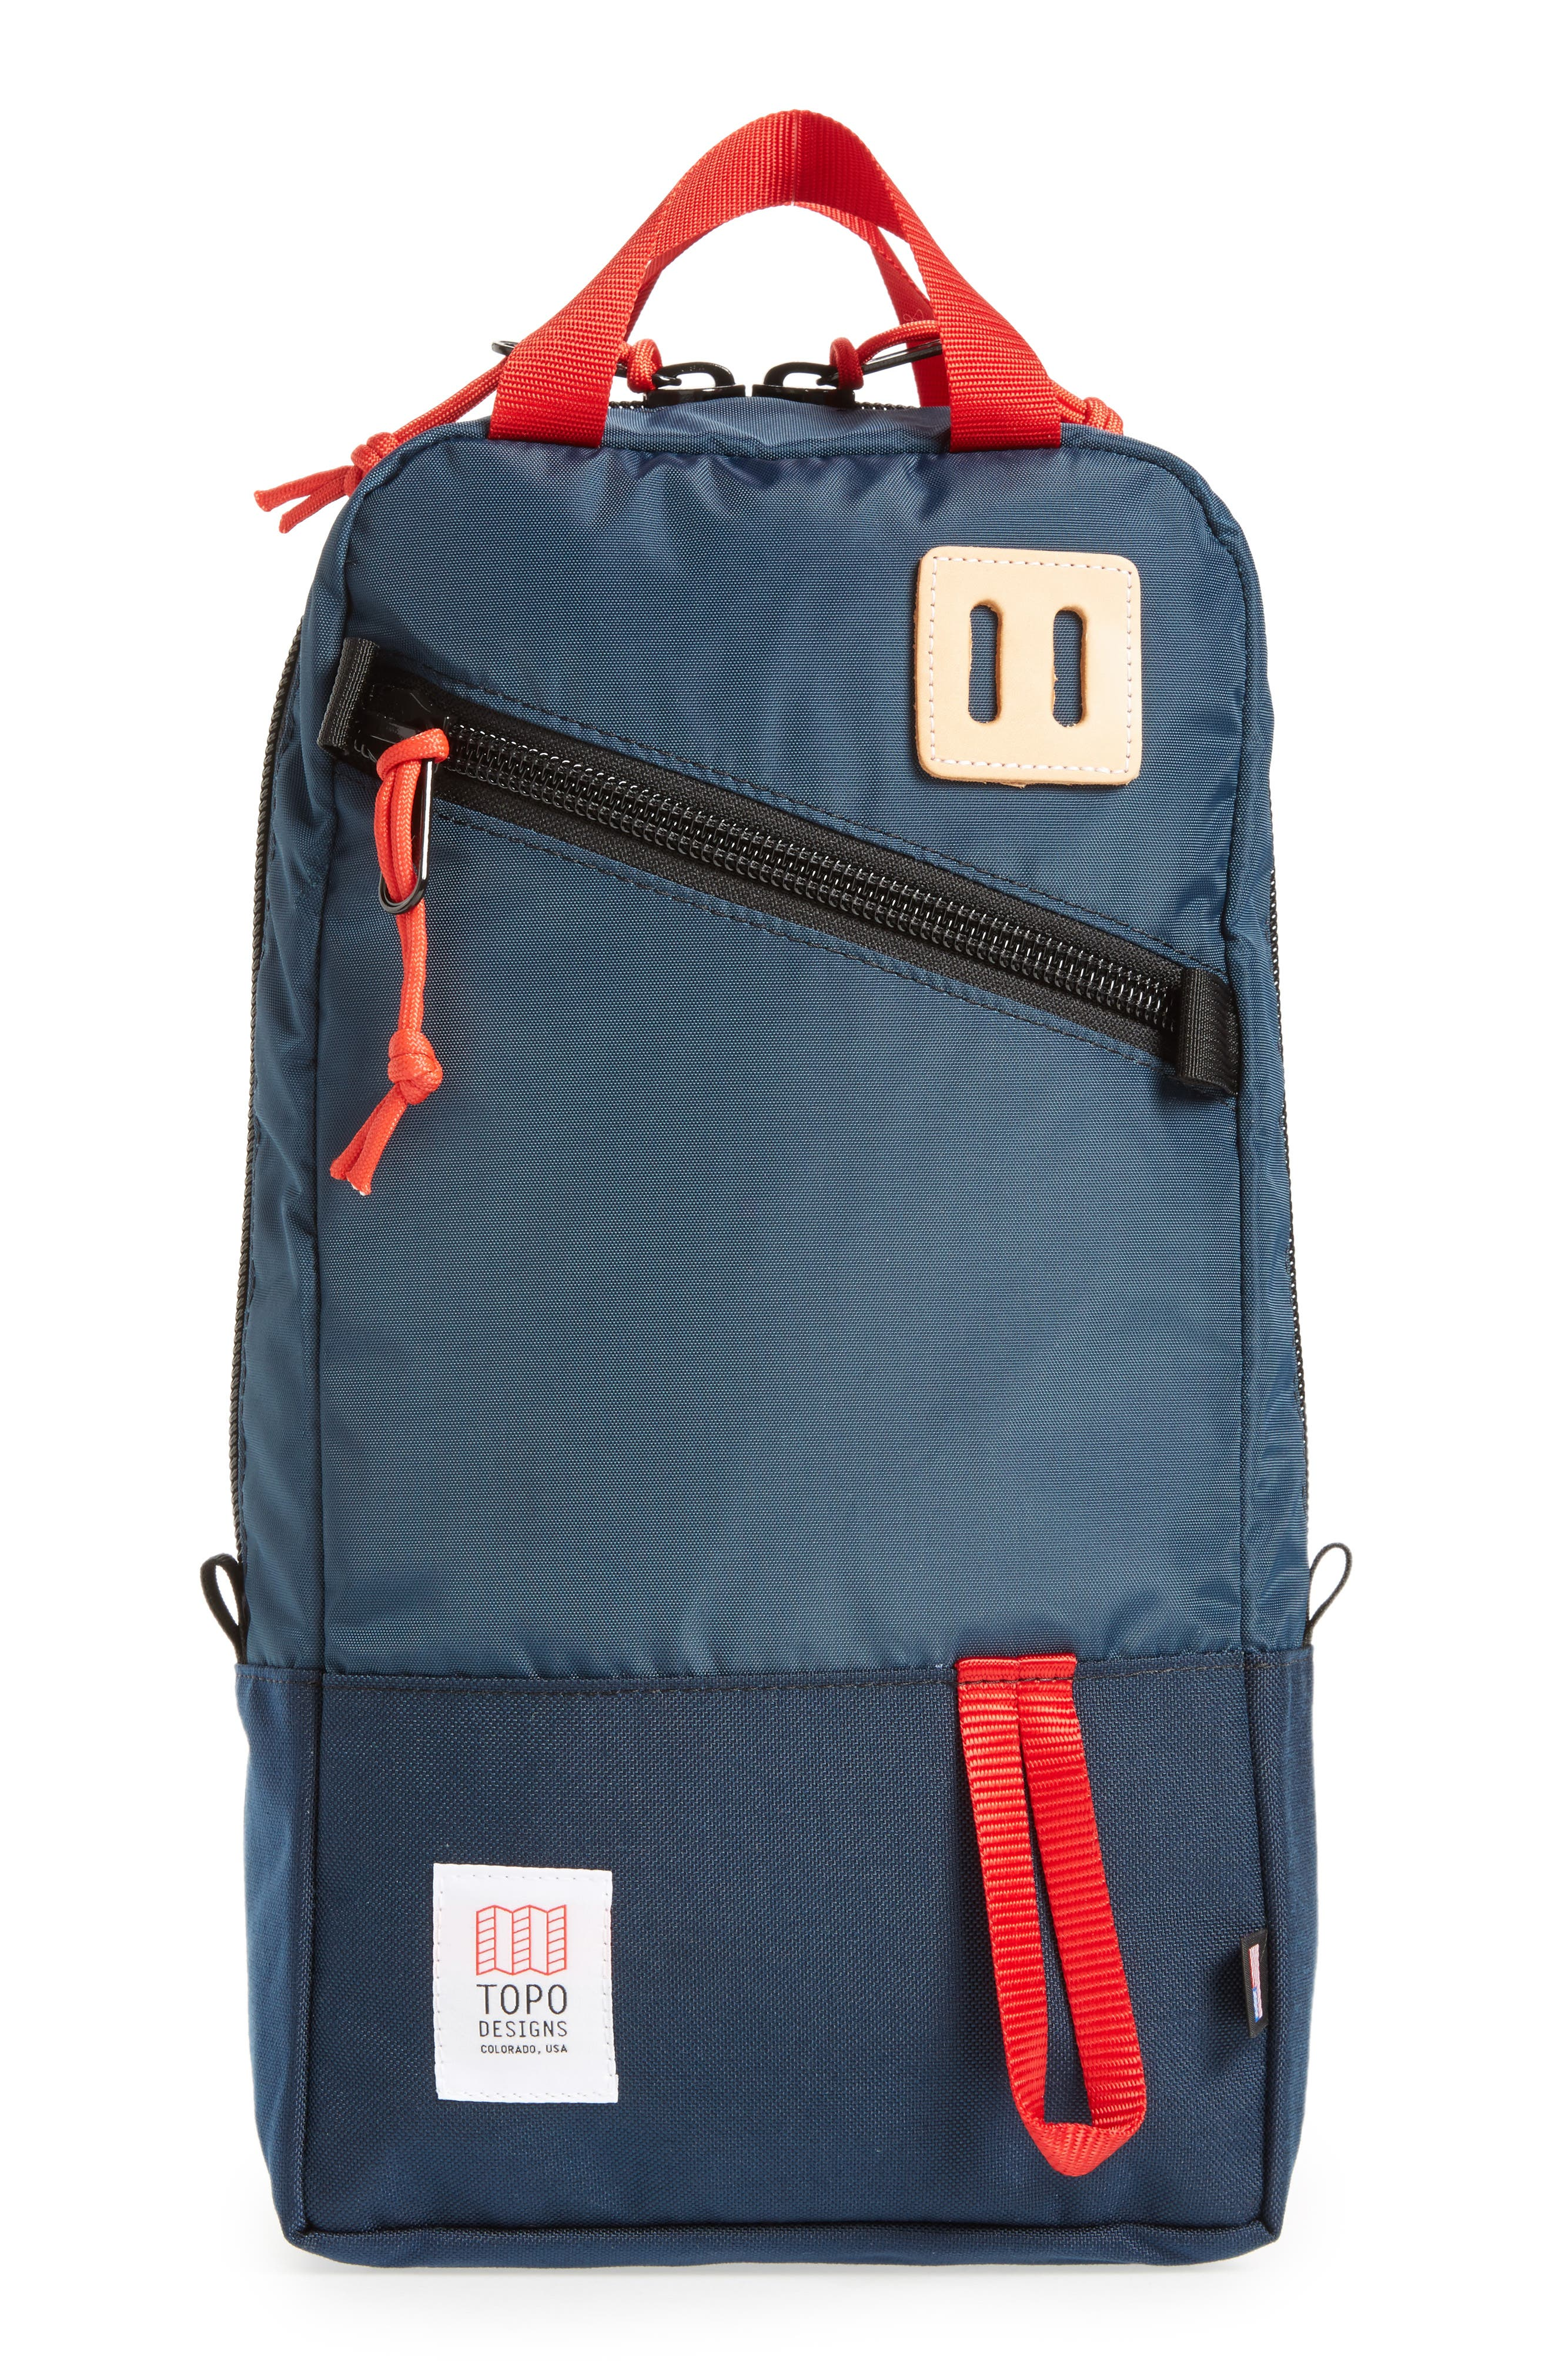 Alternate Image 1 Selected - Topo Designs Trip Backpack